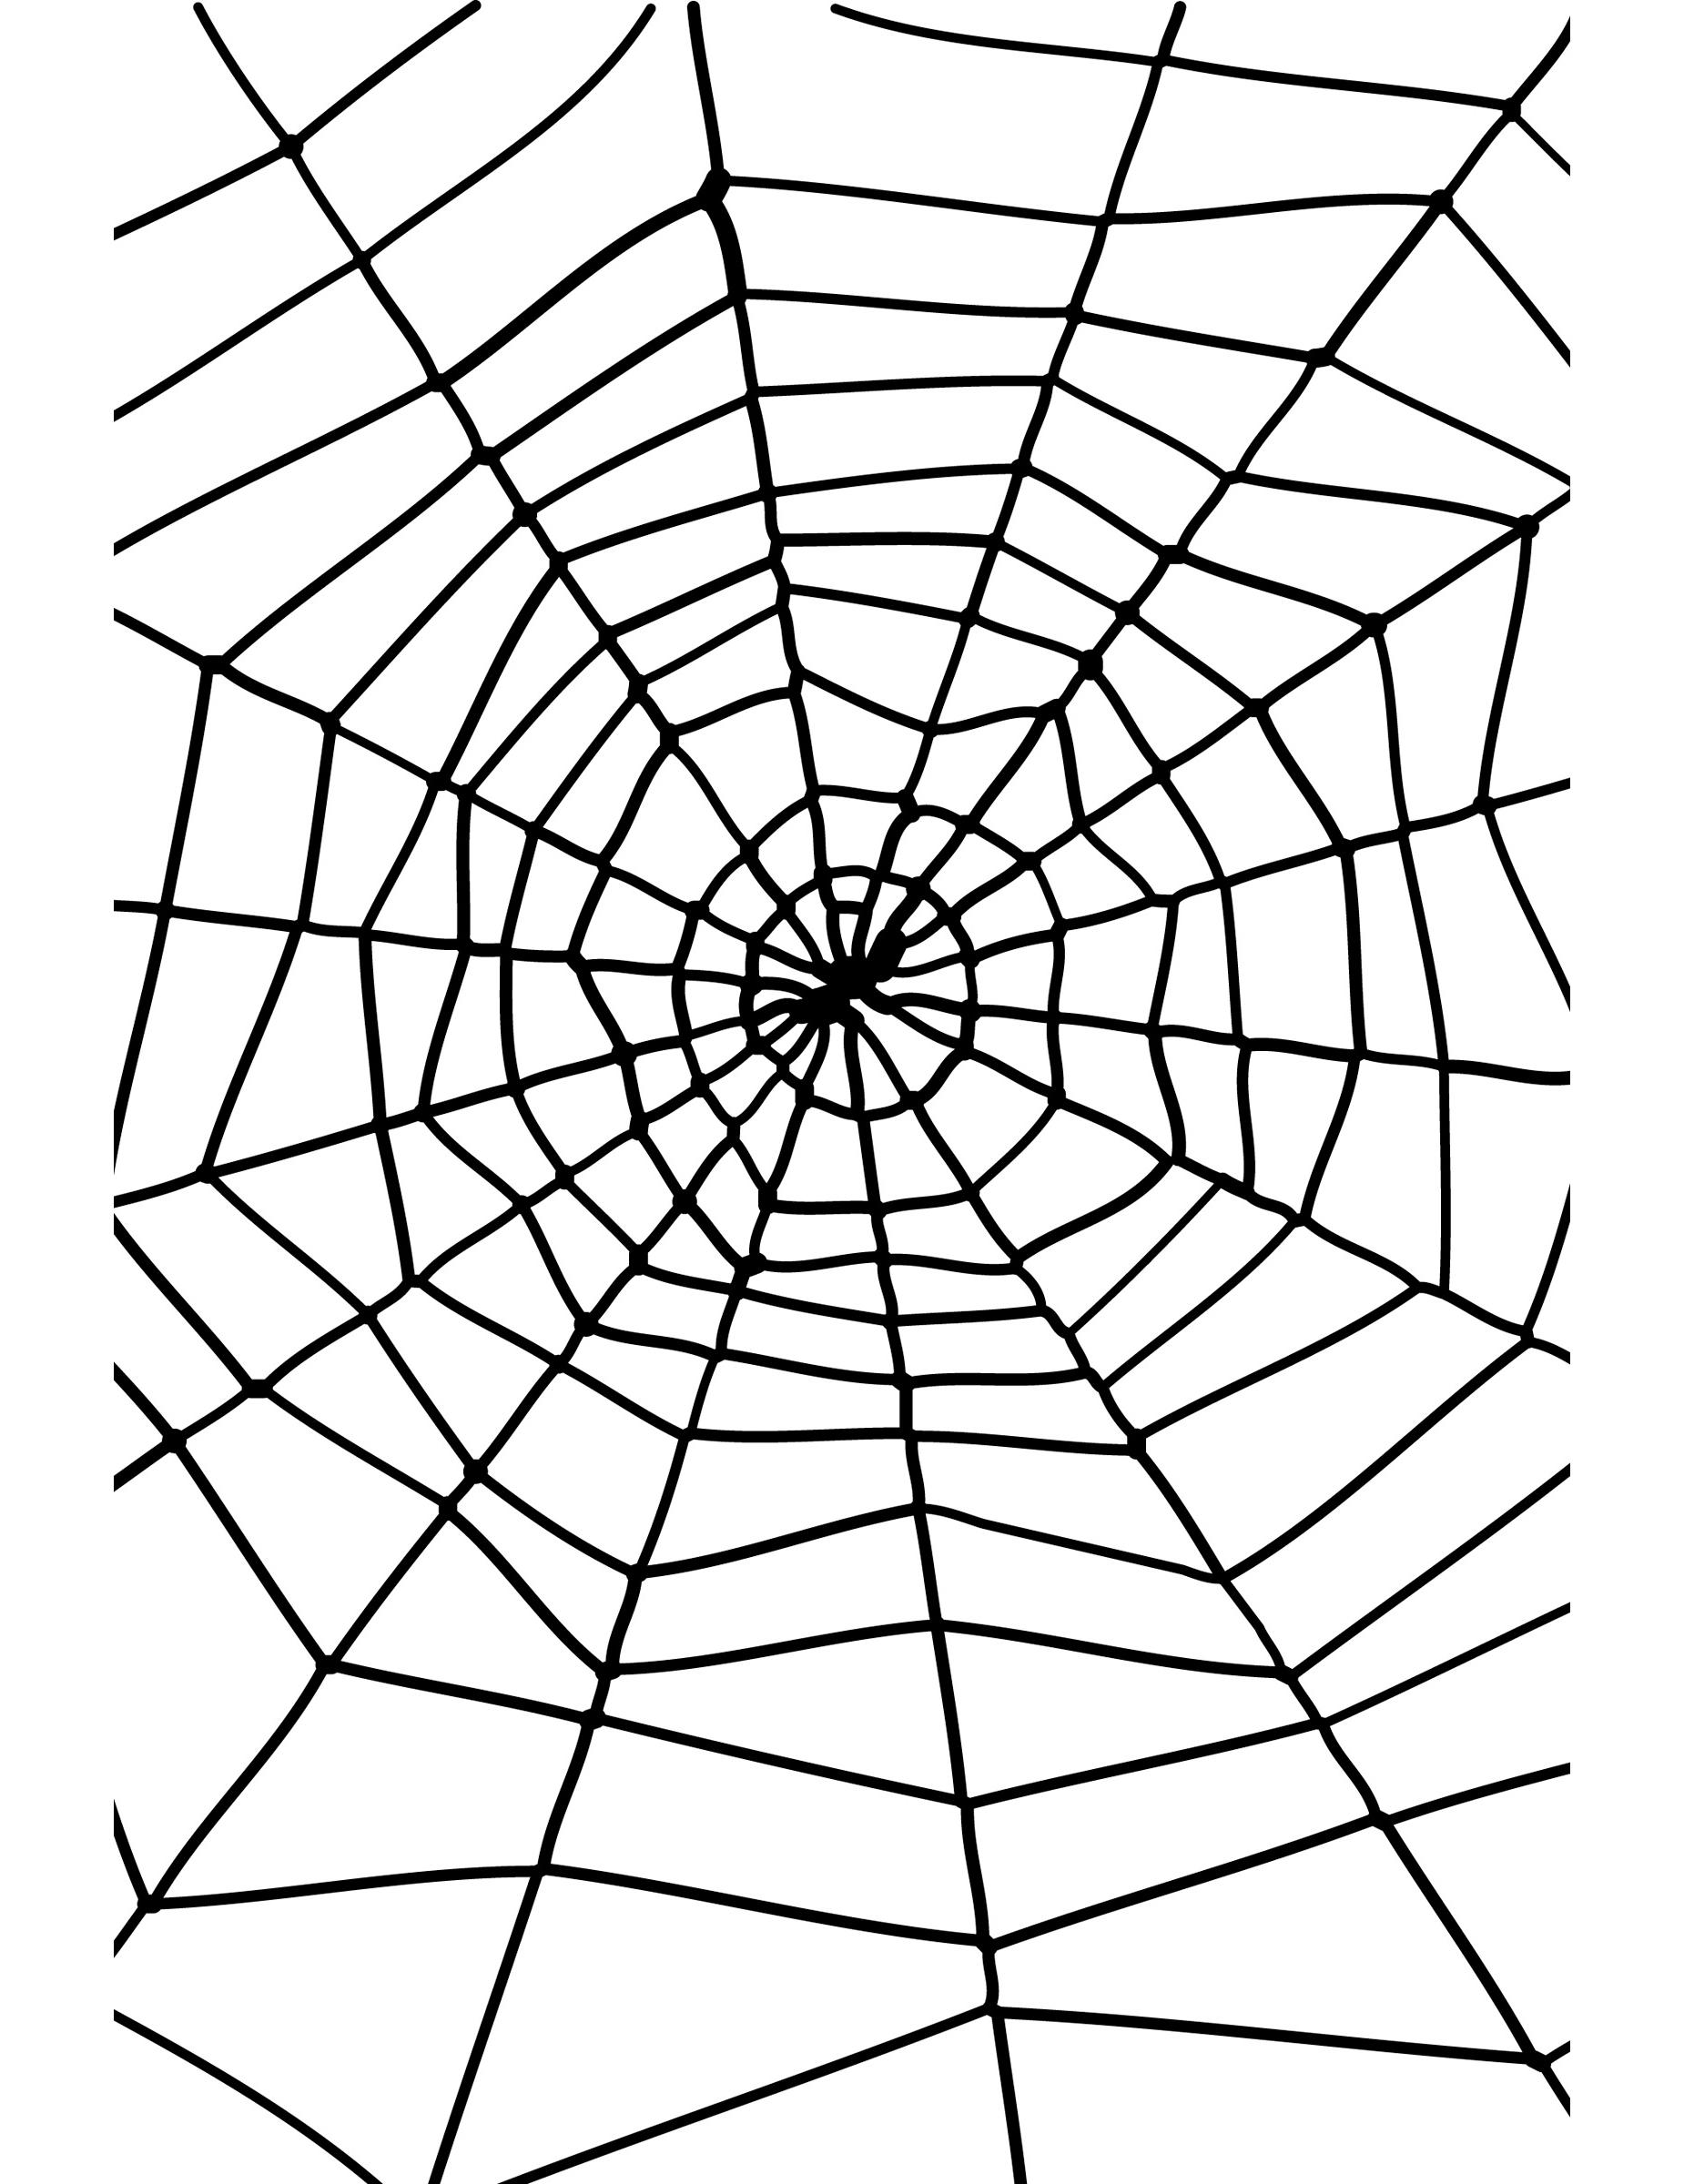 Toile d 39 araign e halloween deguise toi achat de for Toile d araignee decoration